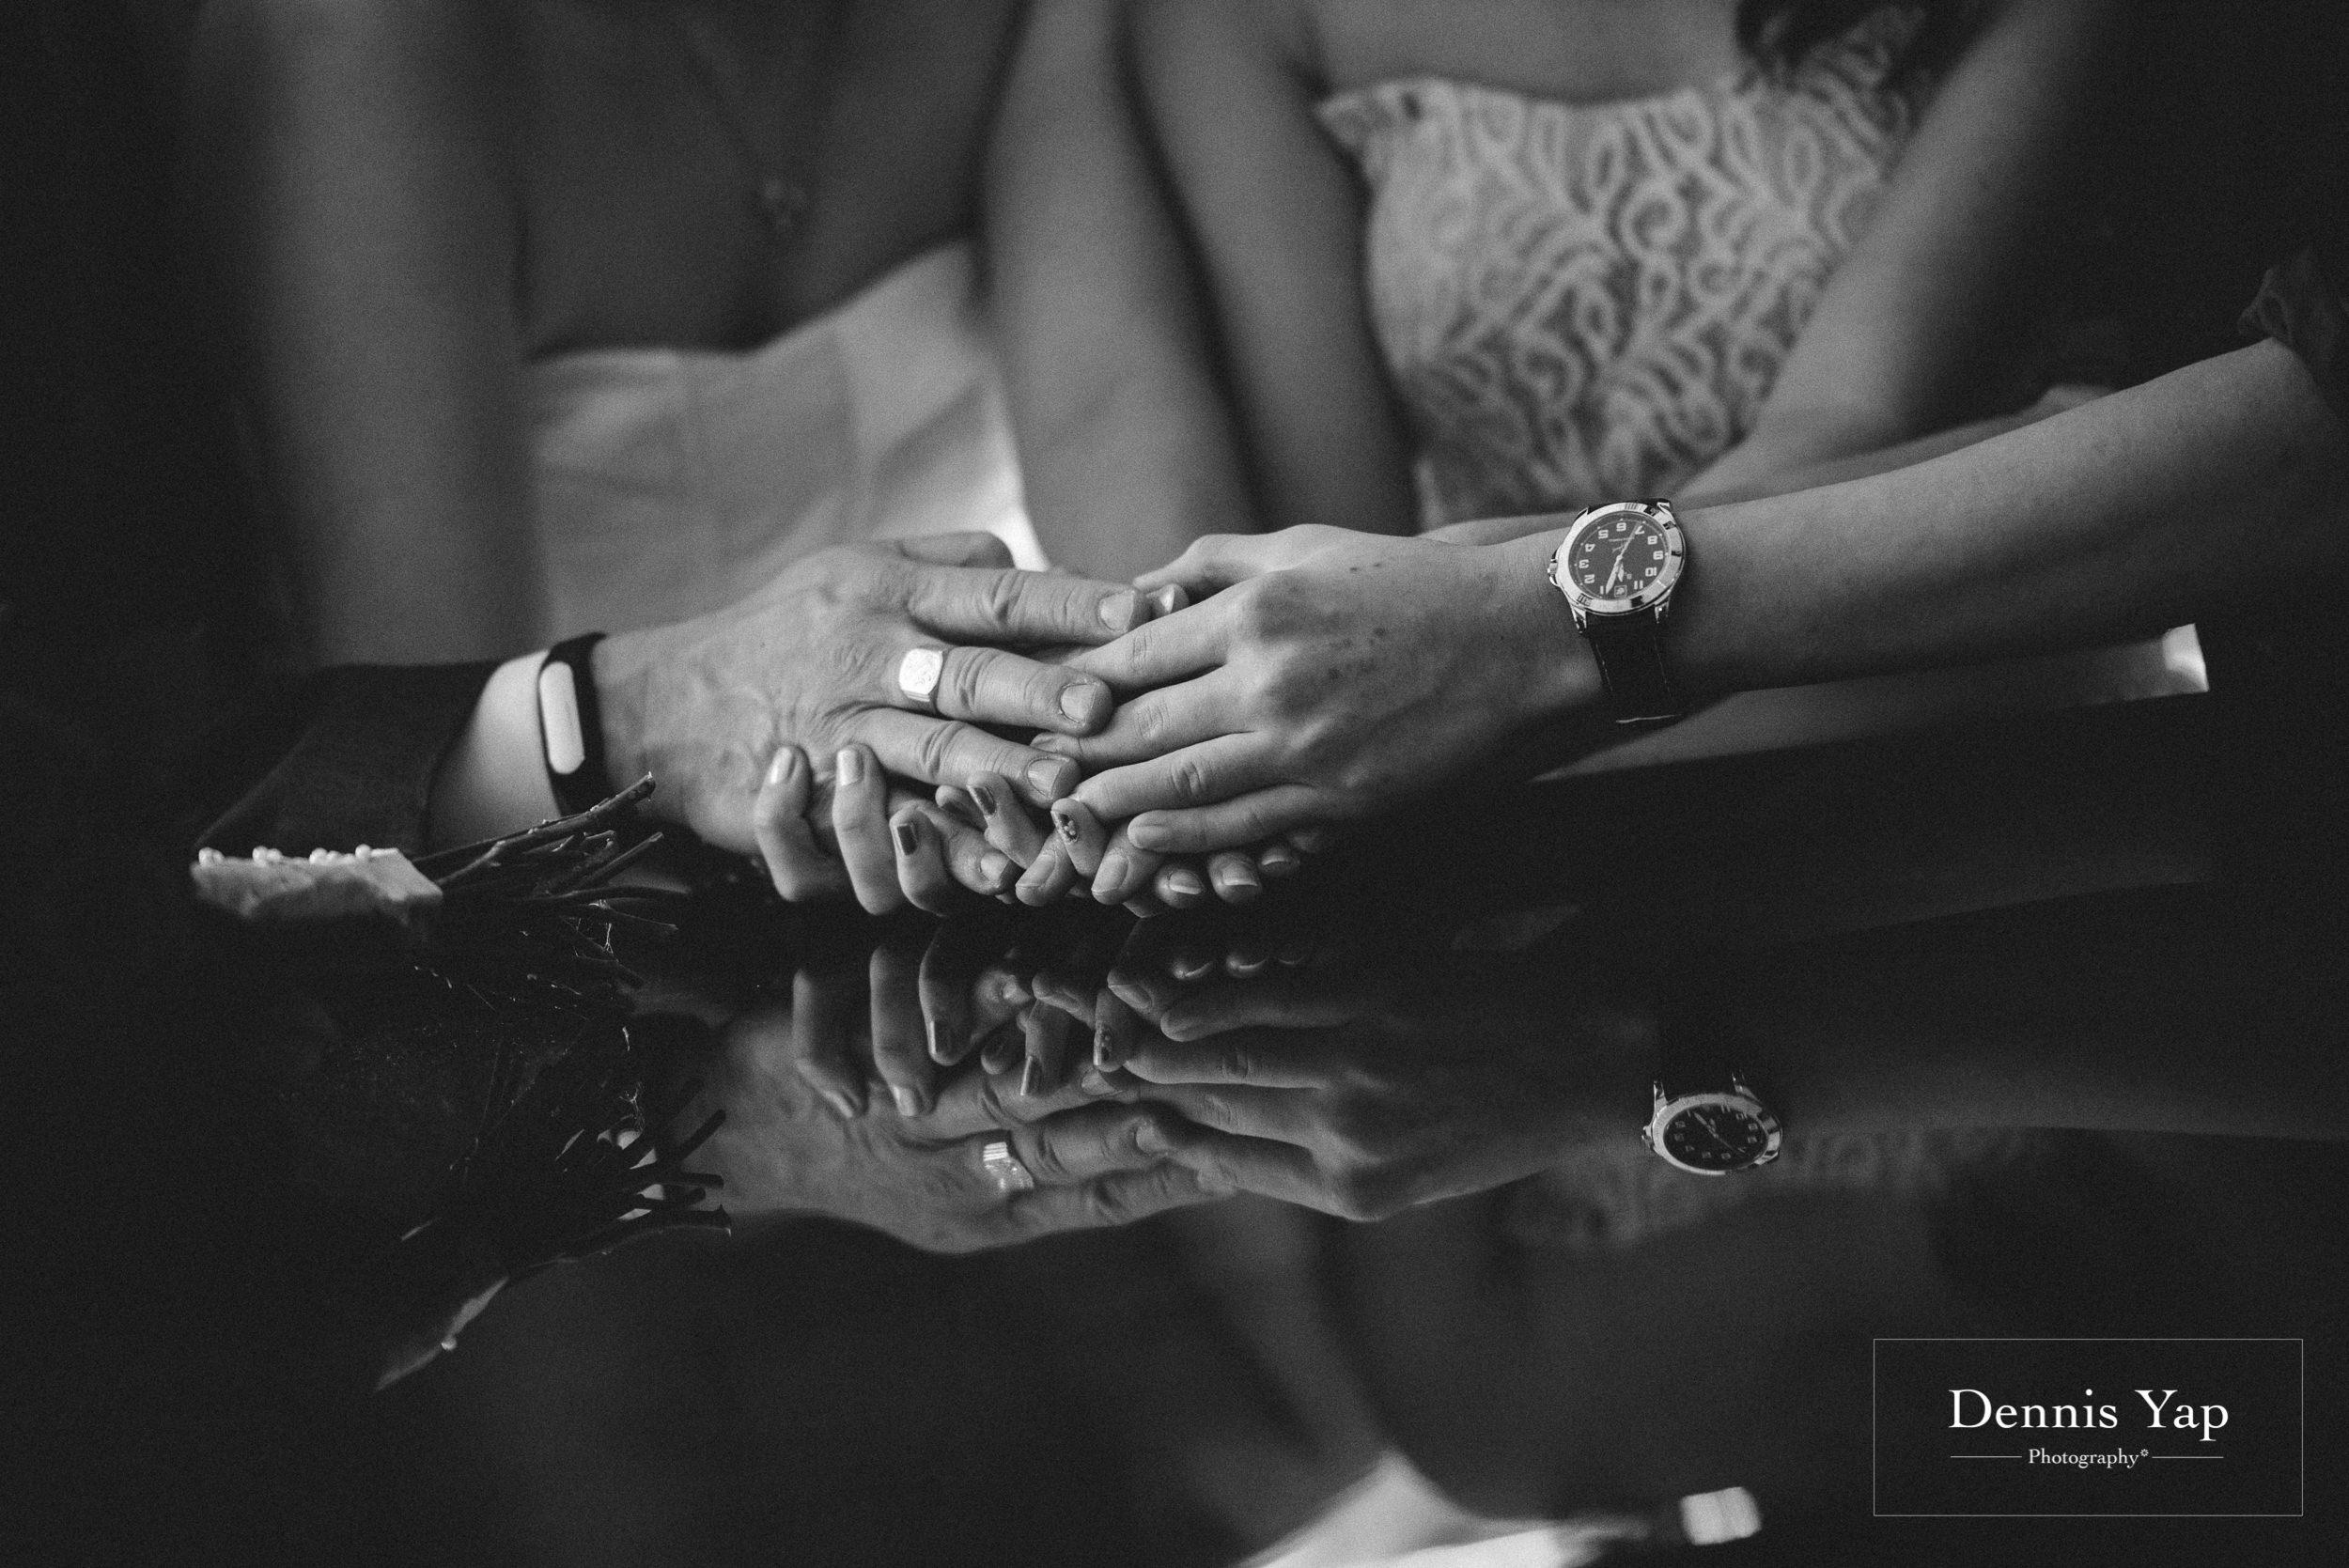 boon weng cyndy love family values pre wedding cameron highlands smoke house dennis yap photography-71.jpg